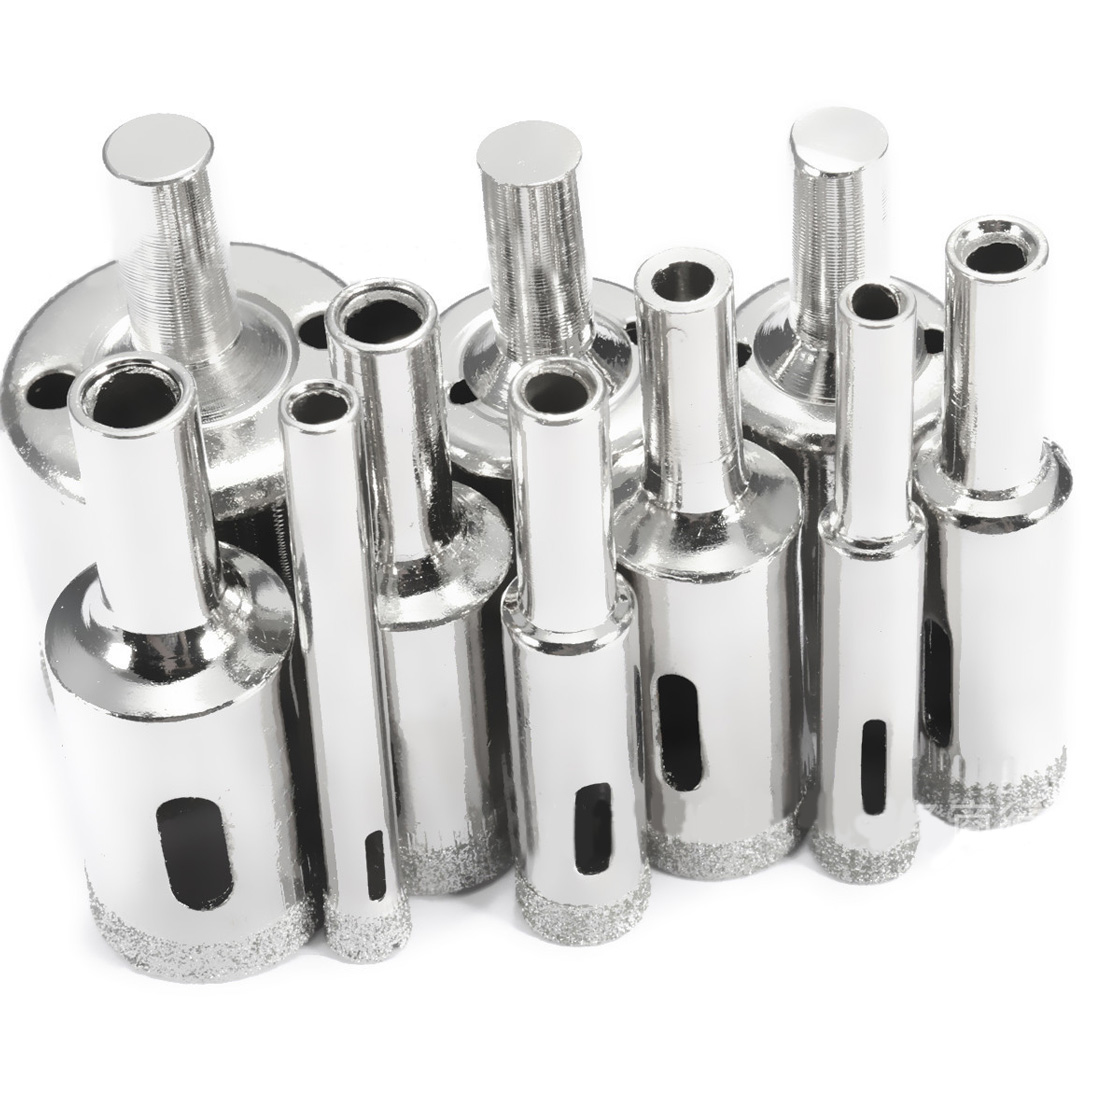 10 Pcs Diamond Drill Bit Set 6mm-30mm Diamond Coated Core Hole Saw Drill Bits Tool Cutter For Glass Marble Tile Granite Drilling